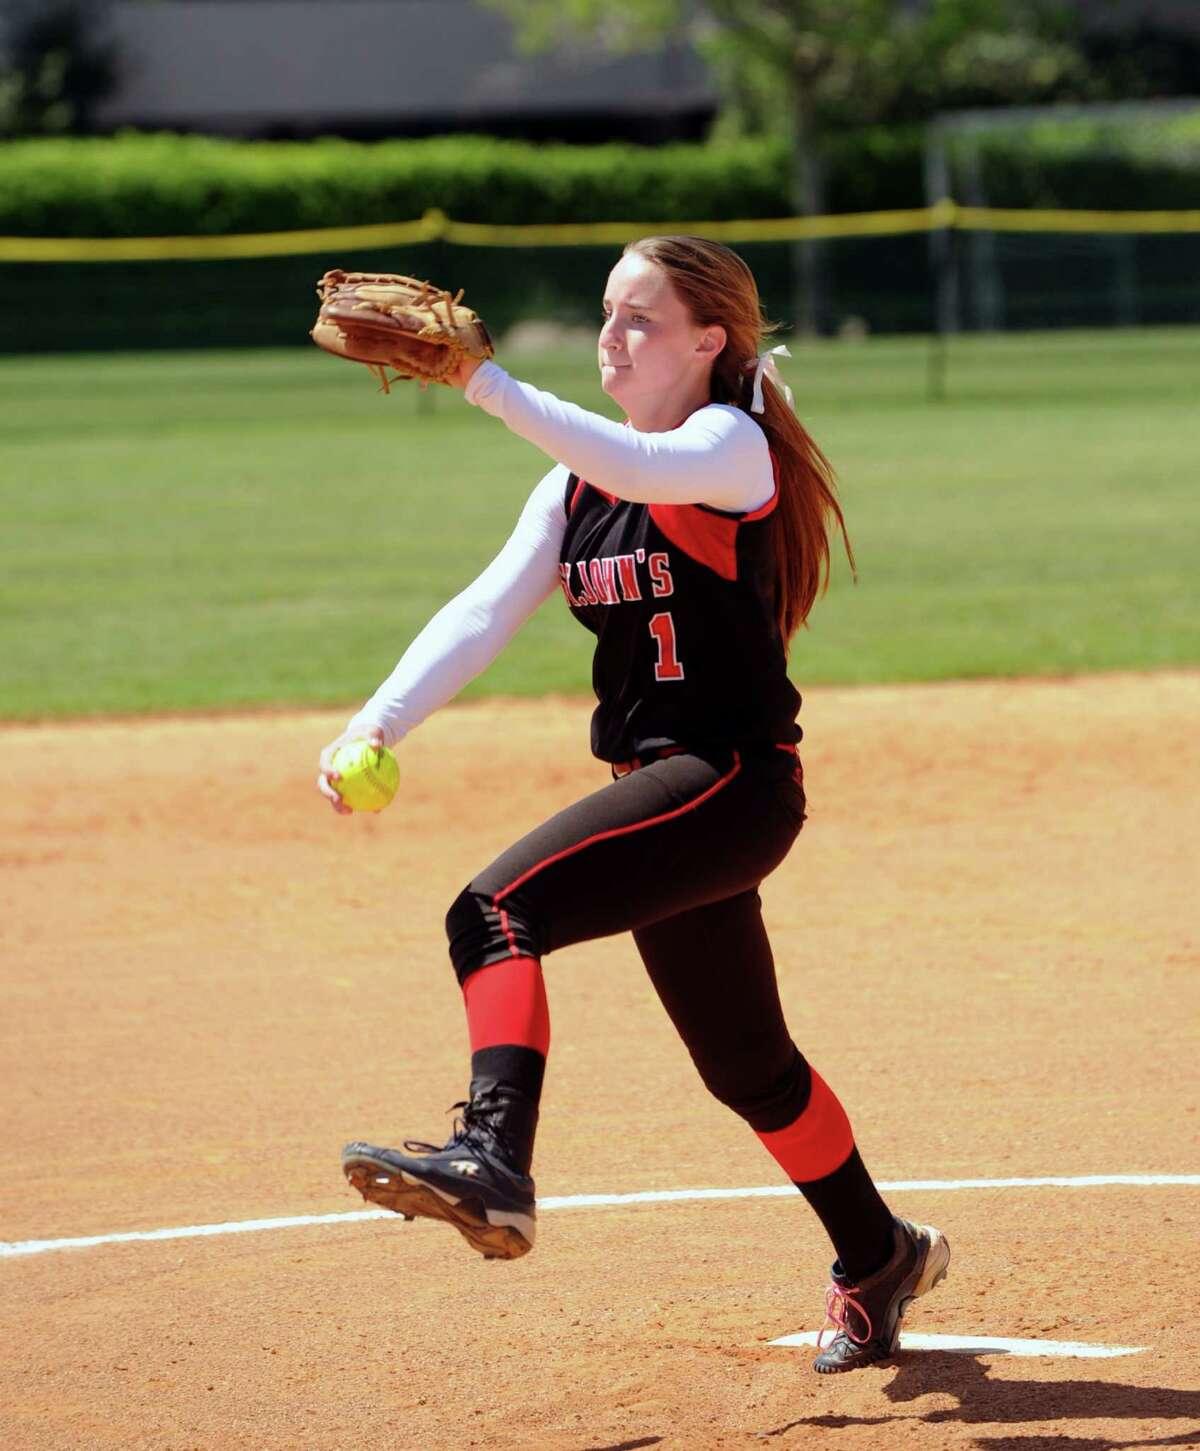 Houston Kinkaid School played a softball game at Houston St. John's Field, 4-2013. Starting pitcher for St. John's is Anna Brooks-Pacha.